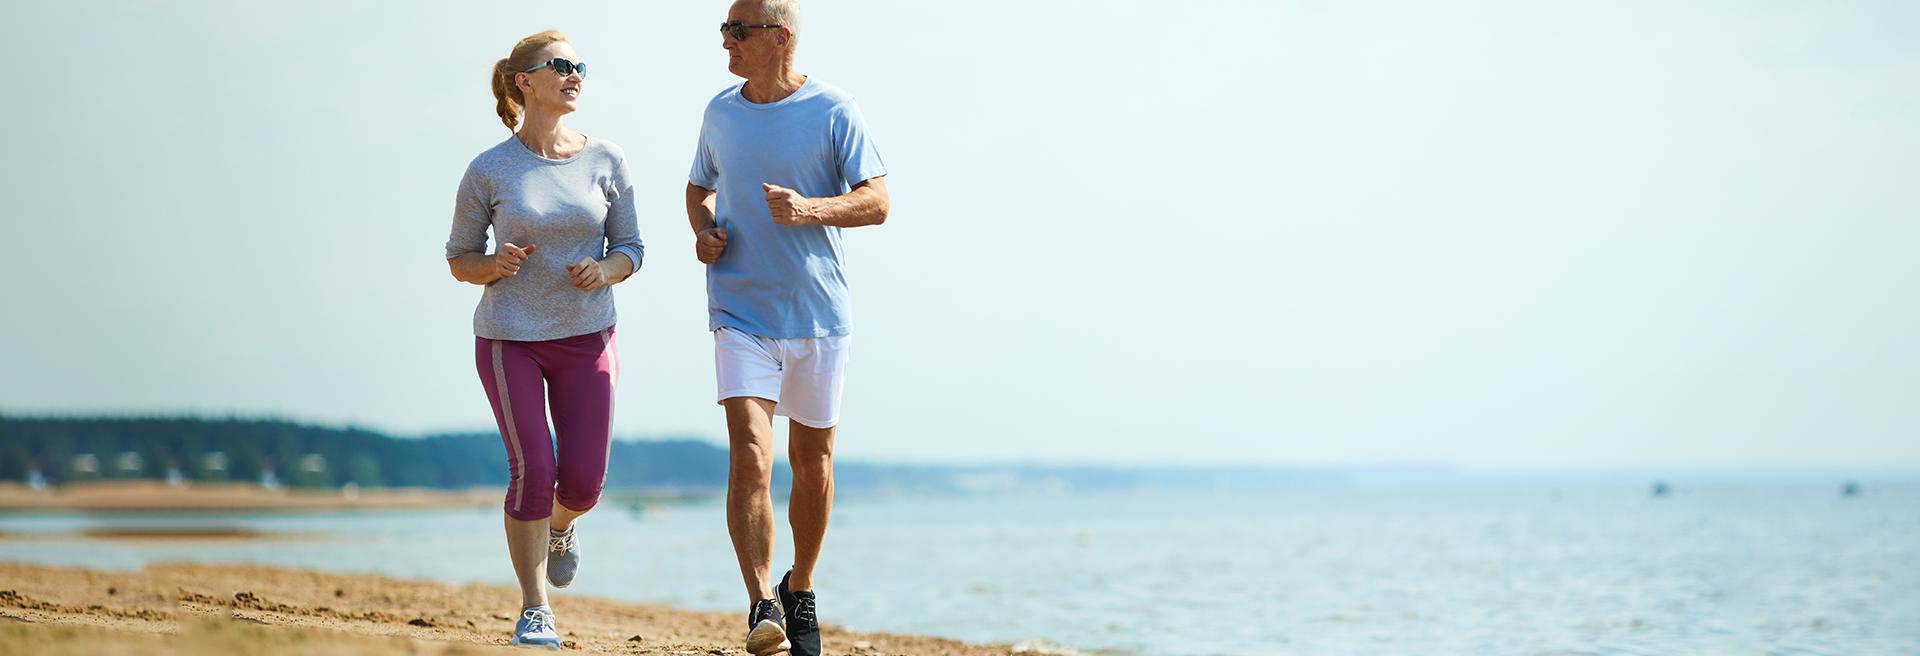 running-on-the-beach-physio-med-pt